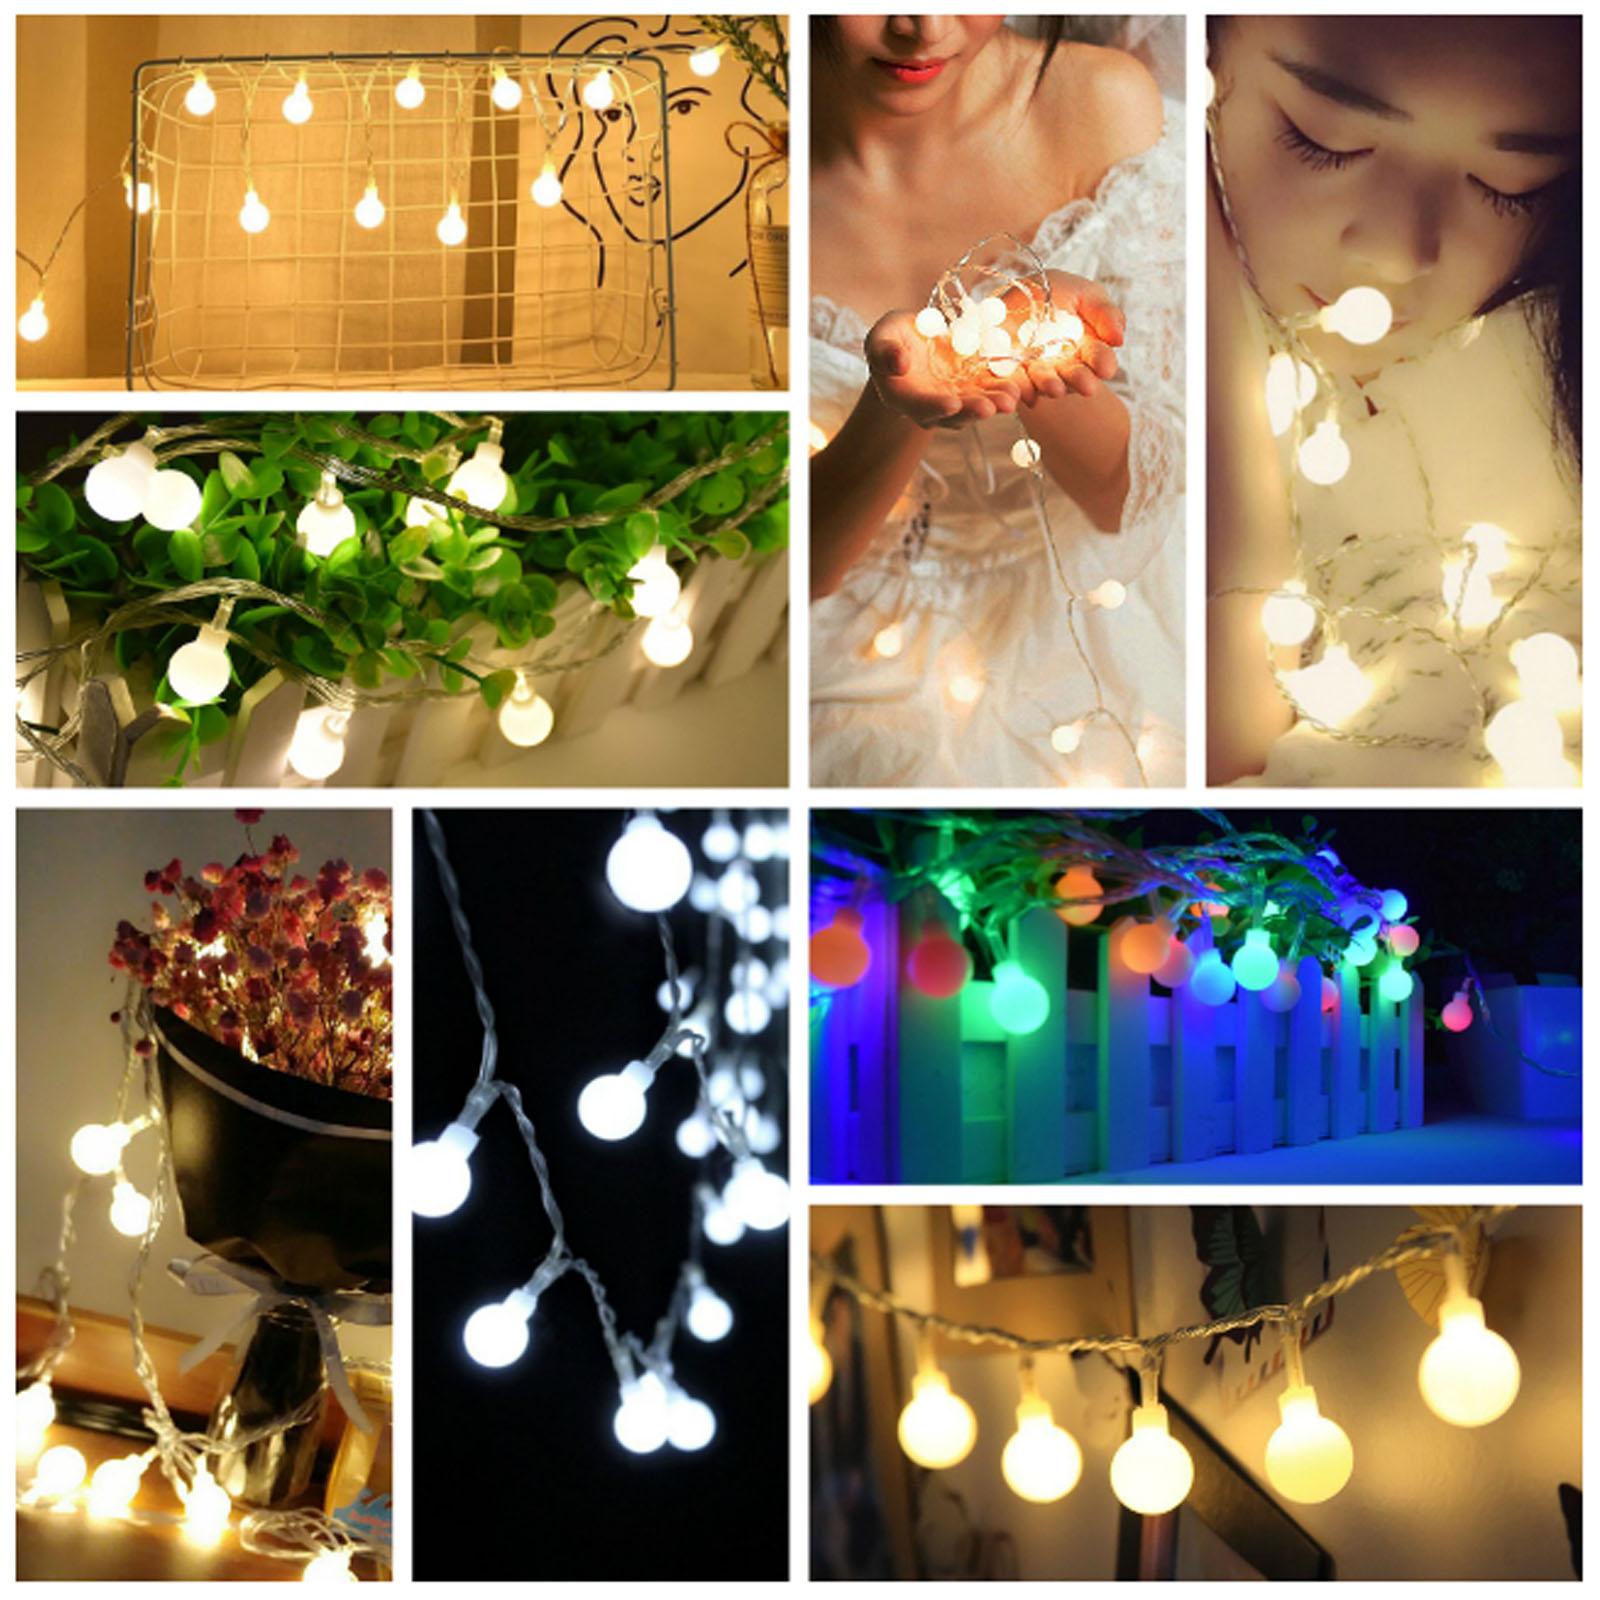 1M 2M 3M 4M 5M LED String Fairy Lights Christmas Round Ball Blubs Wedding Party Lamp 10 20 30 40 50LEDS Party DIY Decor Lighting